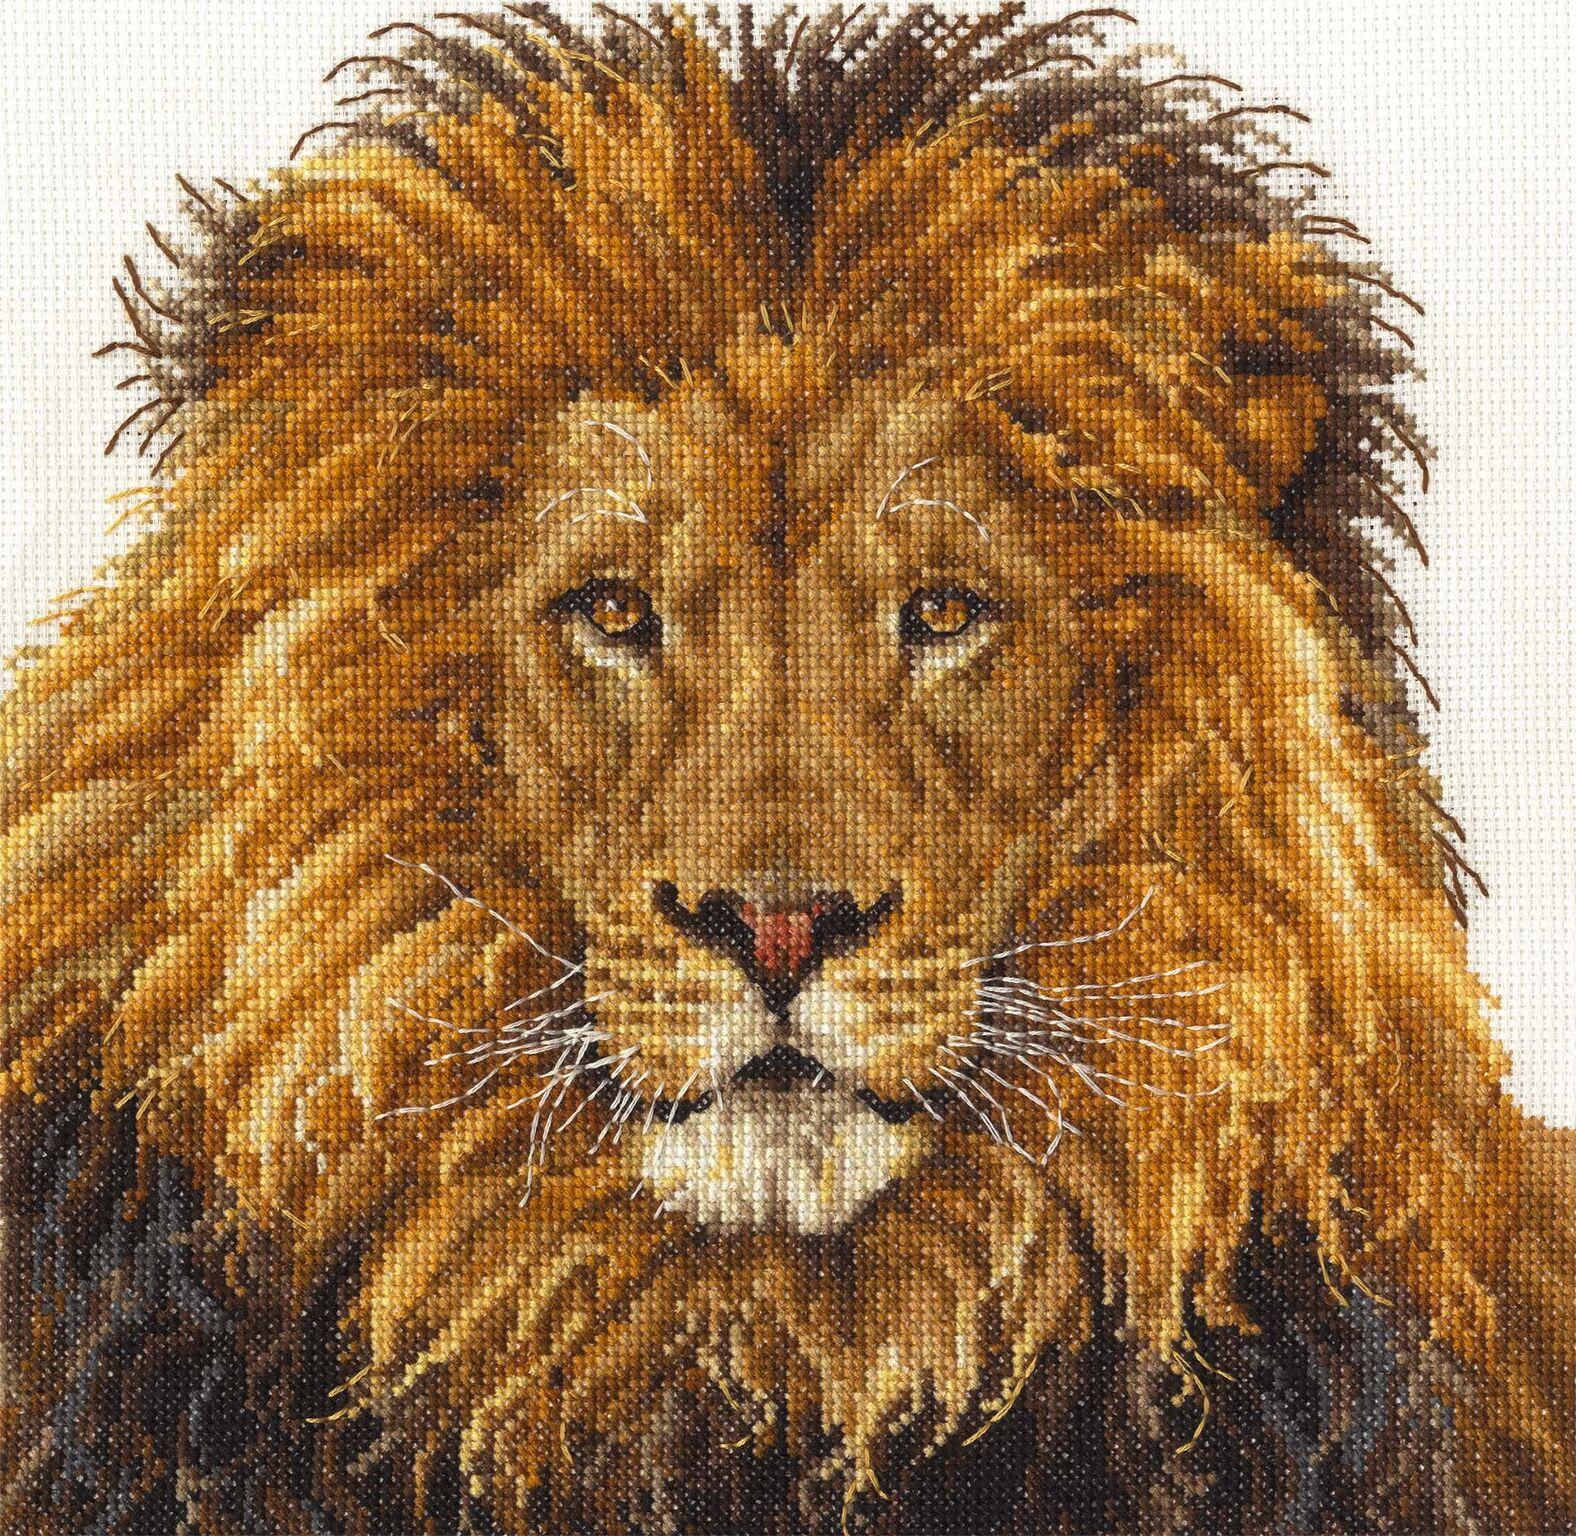 bk1668-lions-pride-preview.jpeg